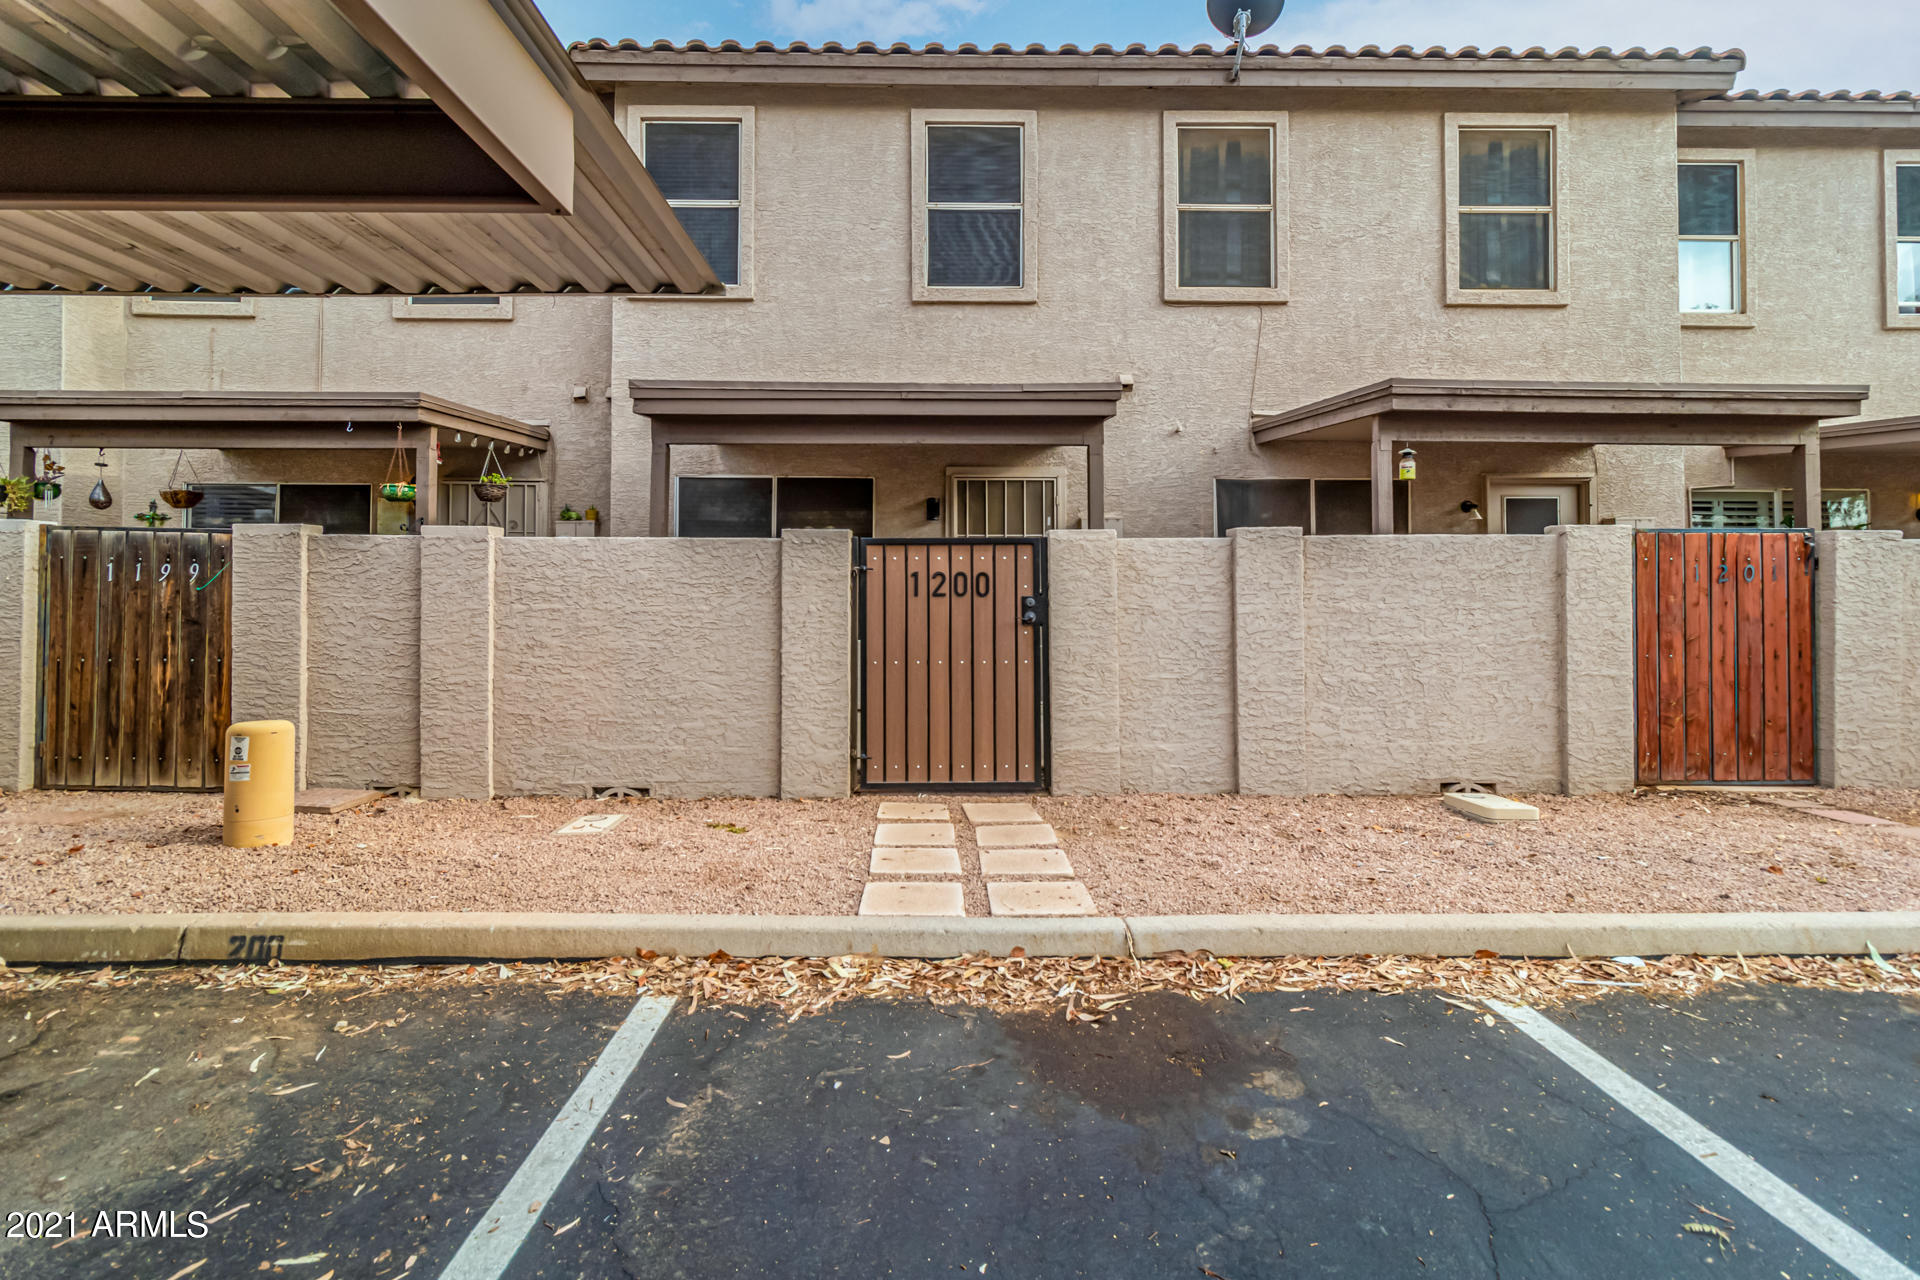 MLS 6267663 1961 N HARTFORD Street Unit 1200, Chandler, AZ 85225 Chandler AZ Townhome